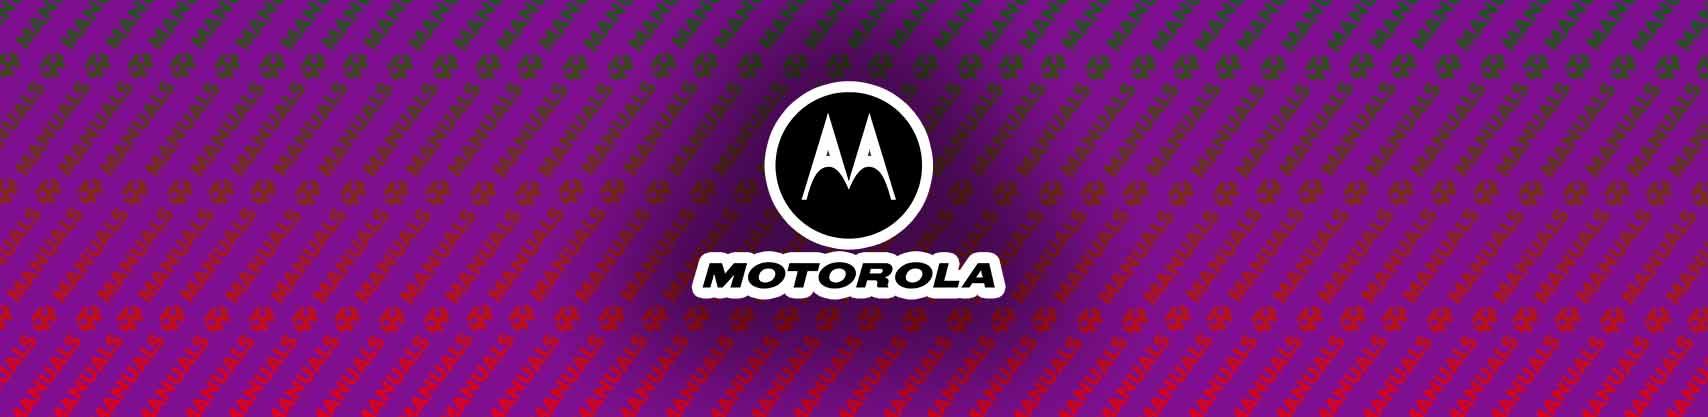 Motorola G5 Plus Manual